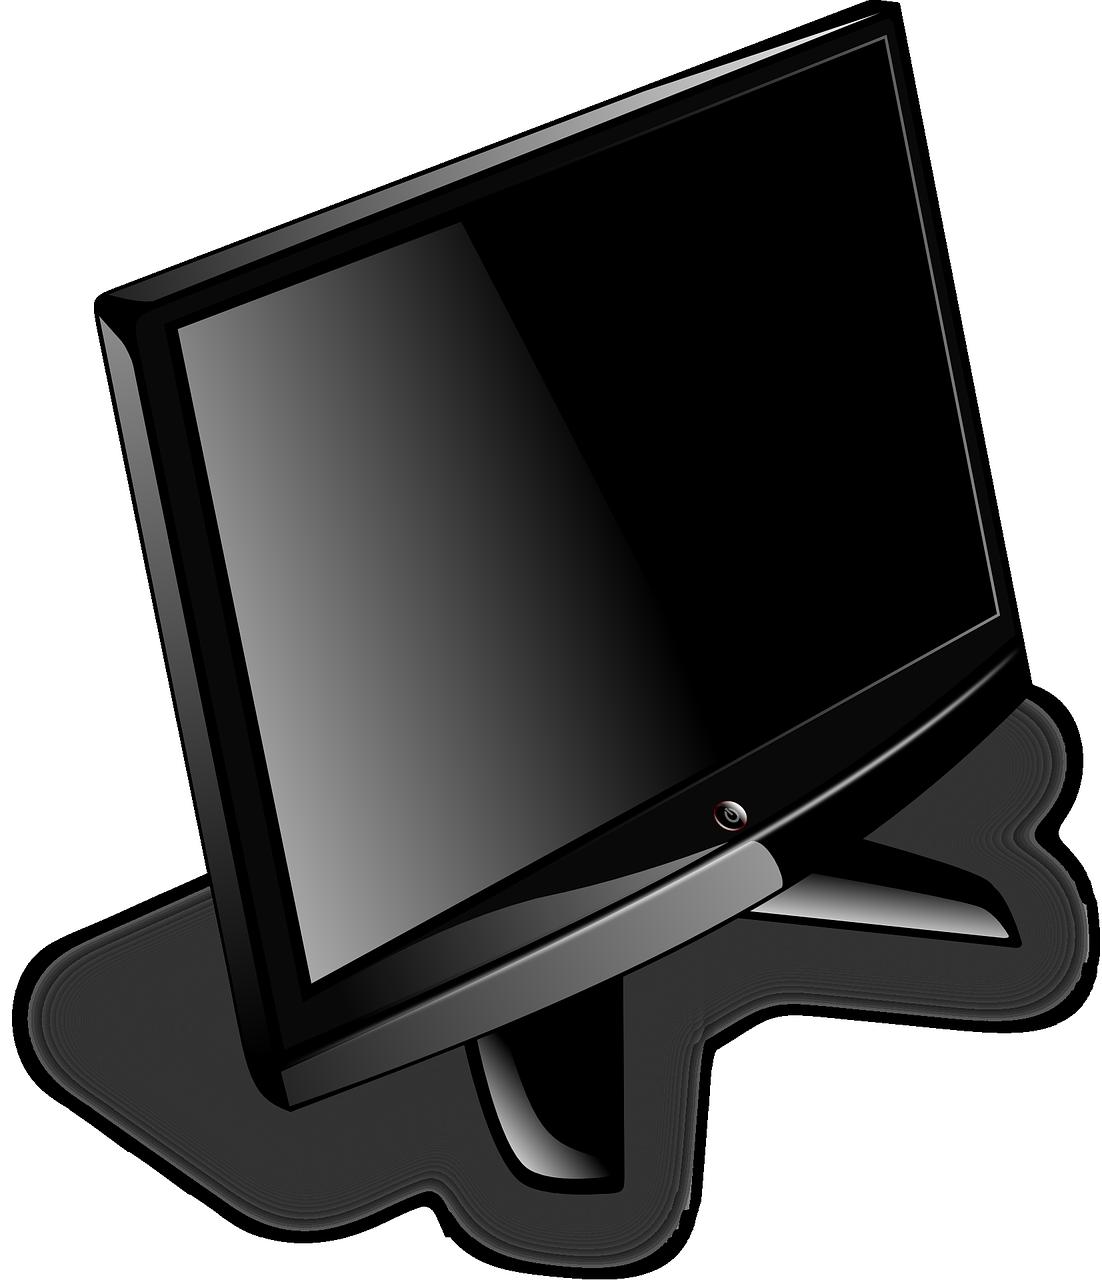 телевизор монитор картинки